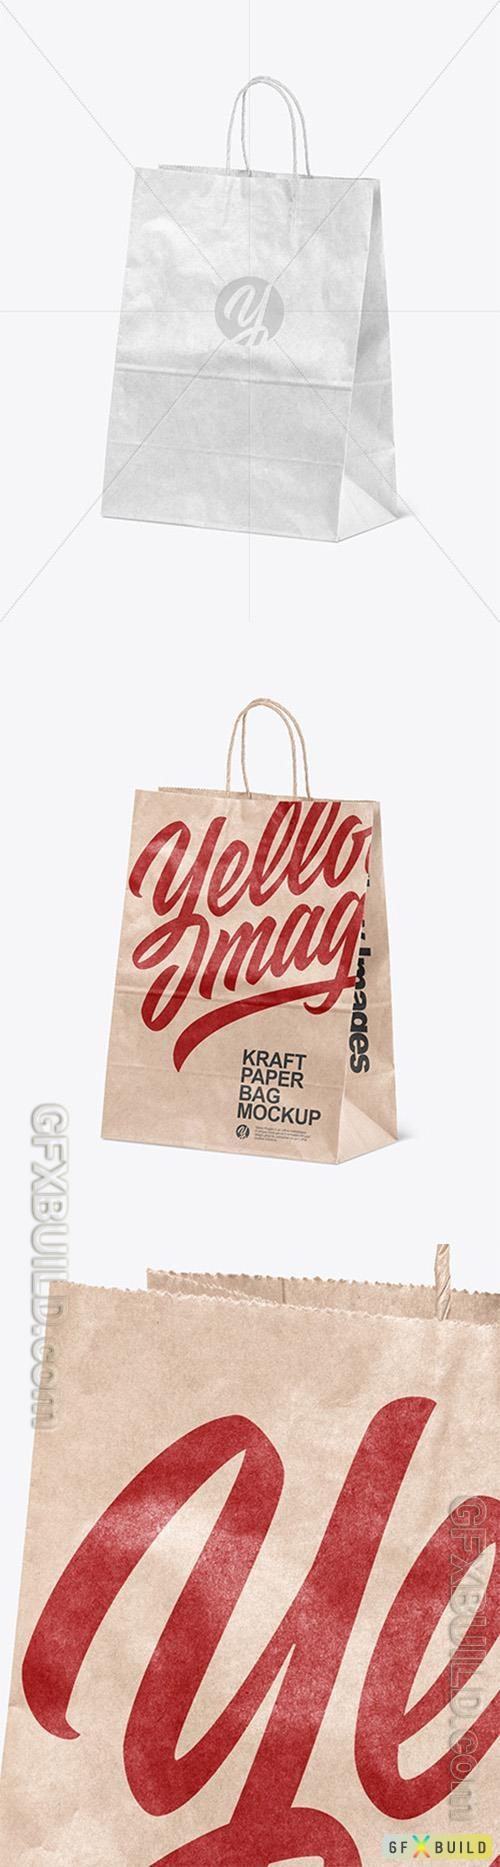 Kraft Paper Shopping Bag Mockup 89329